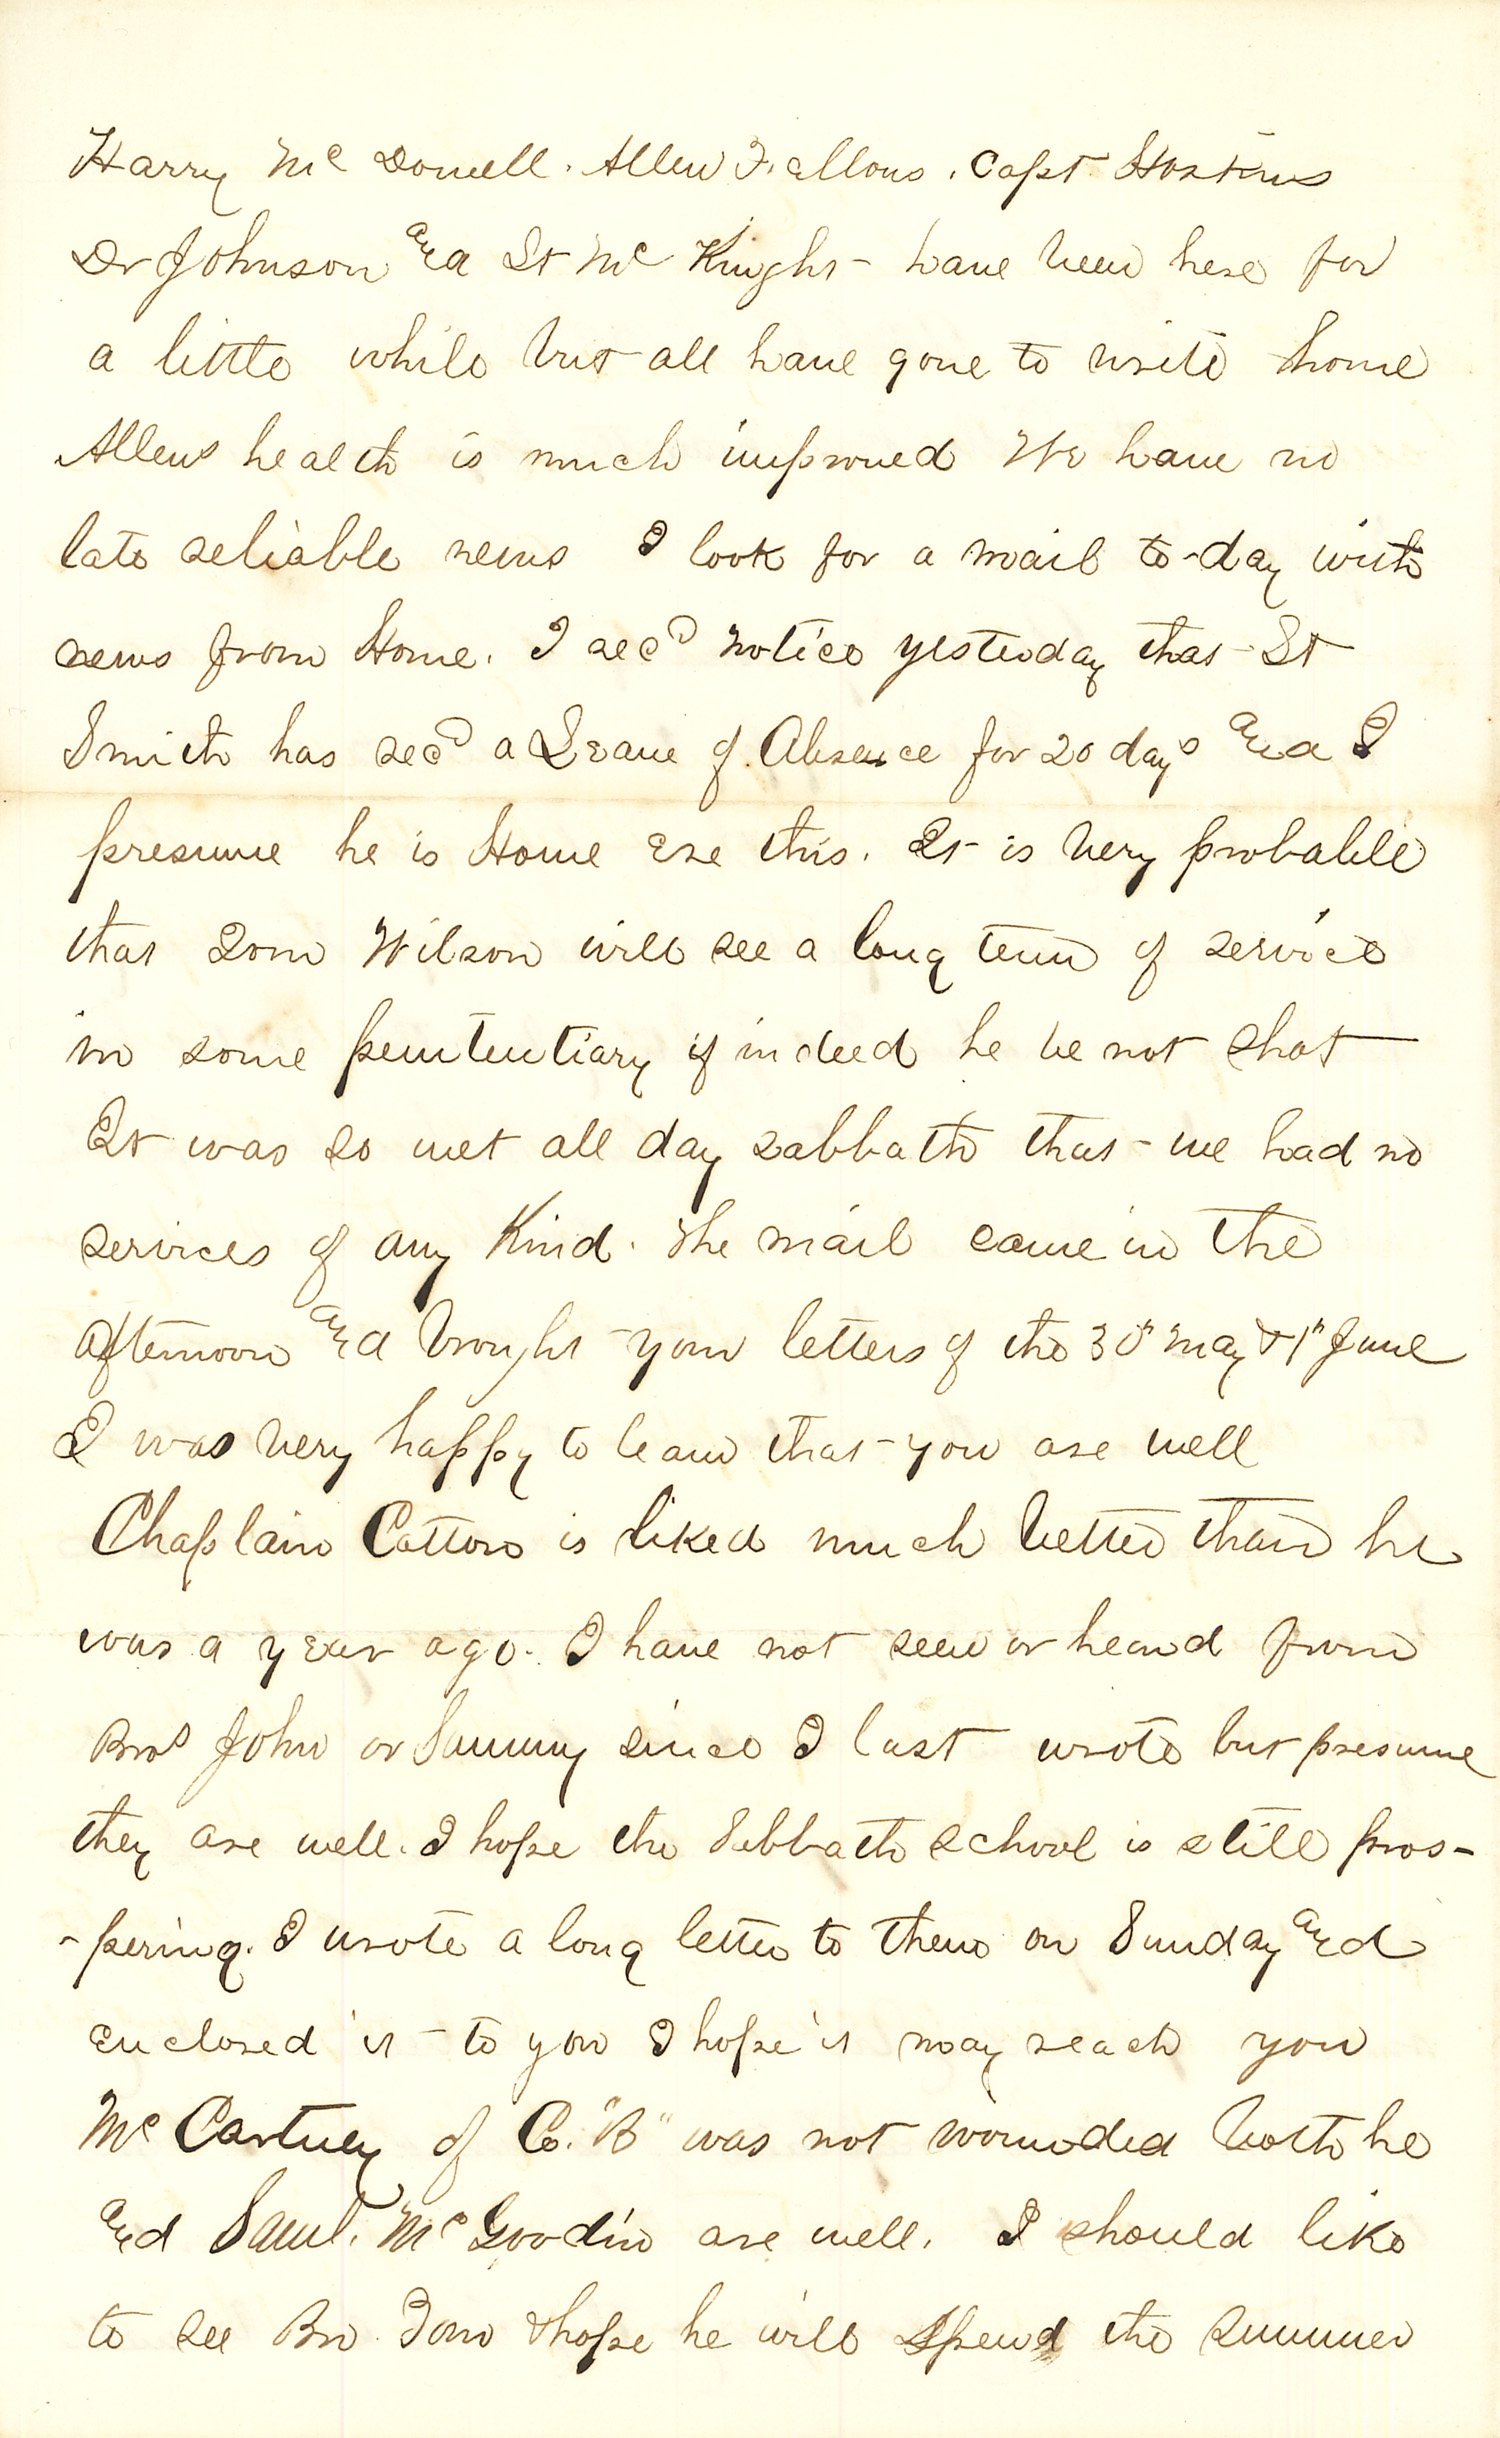 Joseph Culver Letter, June 14, 1864, Page 2